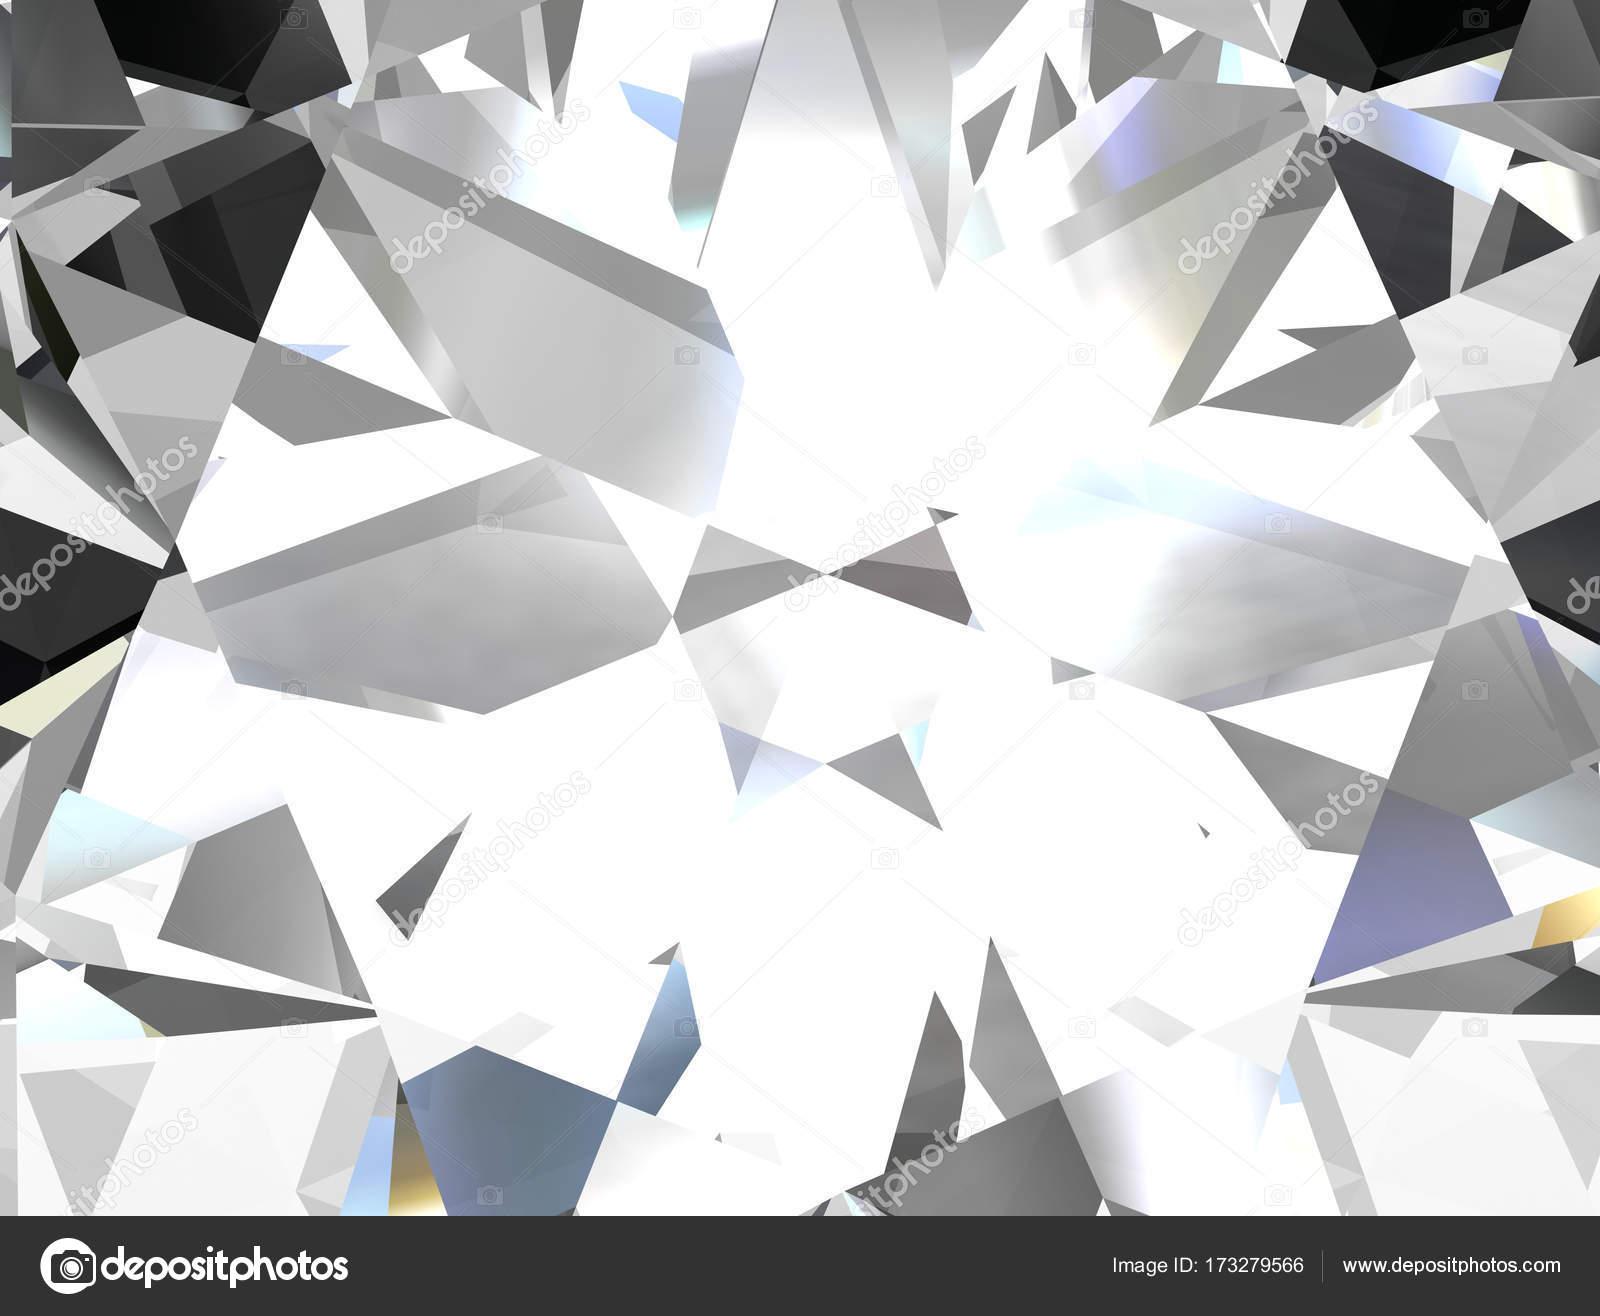 Realistic Diamond Texture Close Illustration — Stock Photo © Boykung #173279566